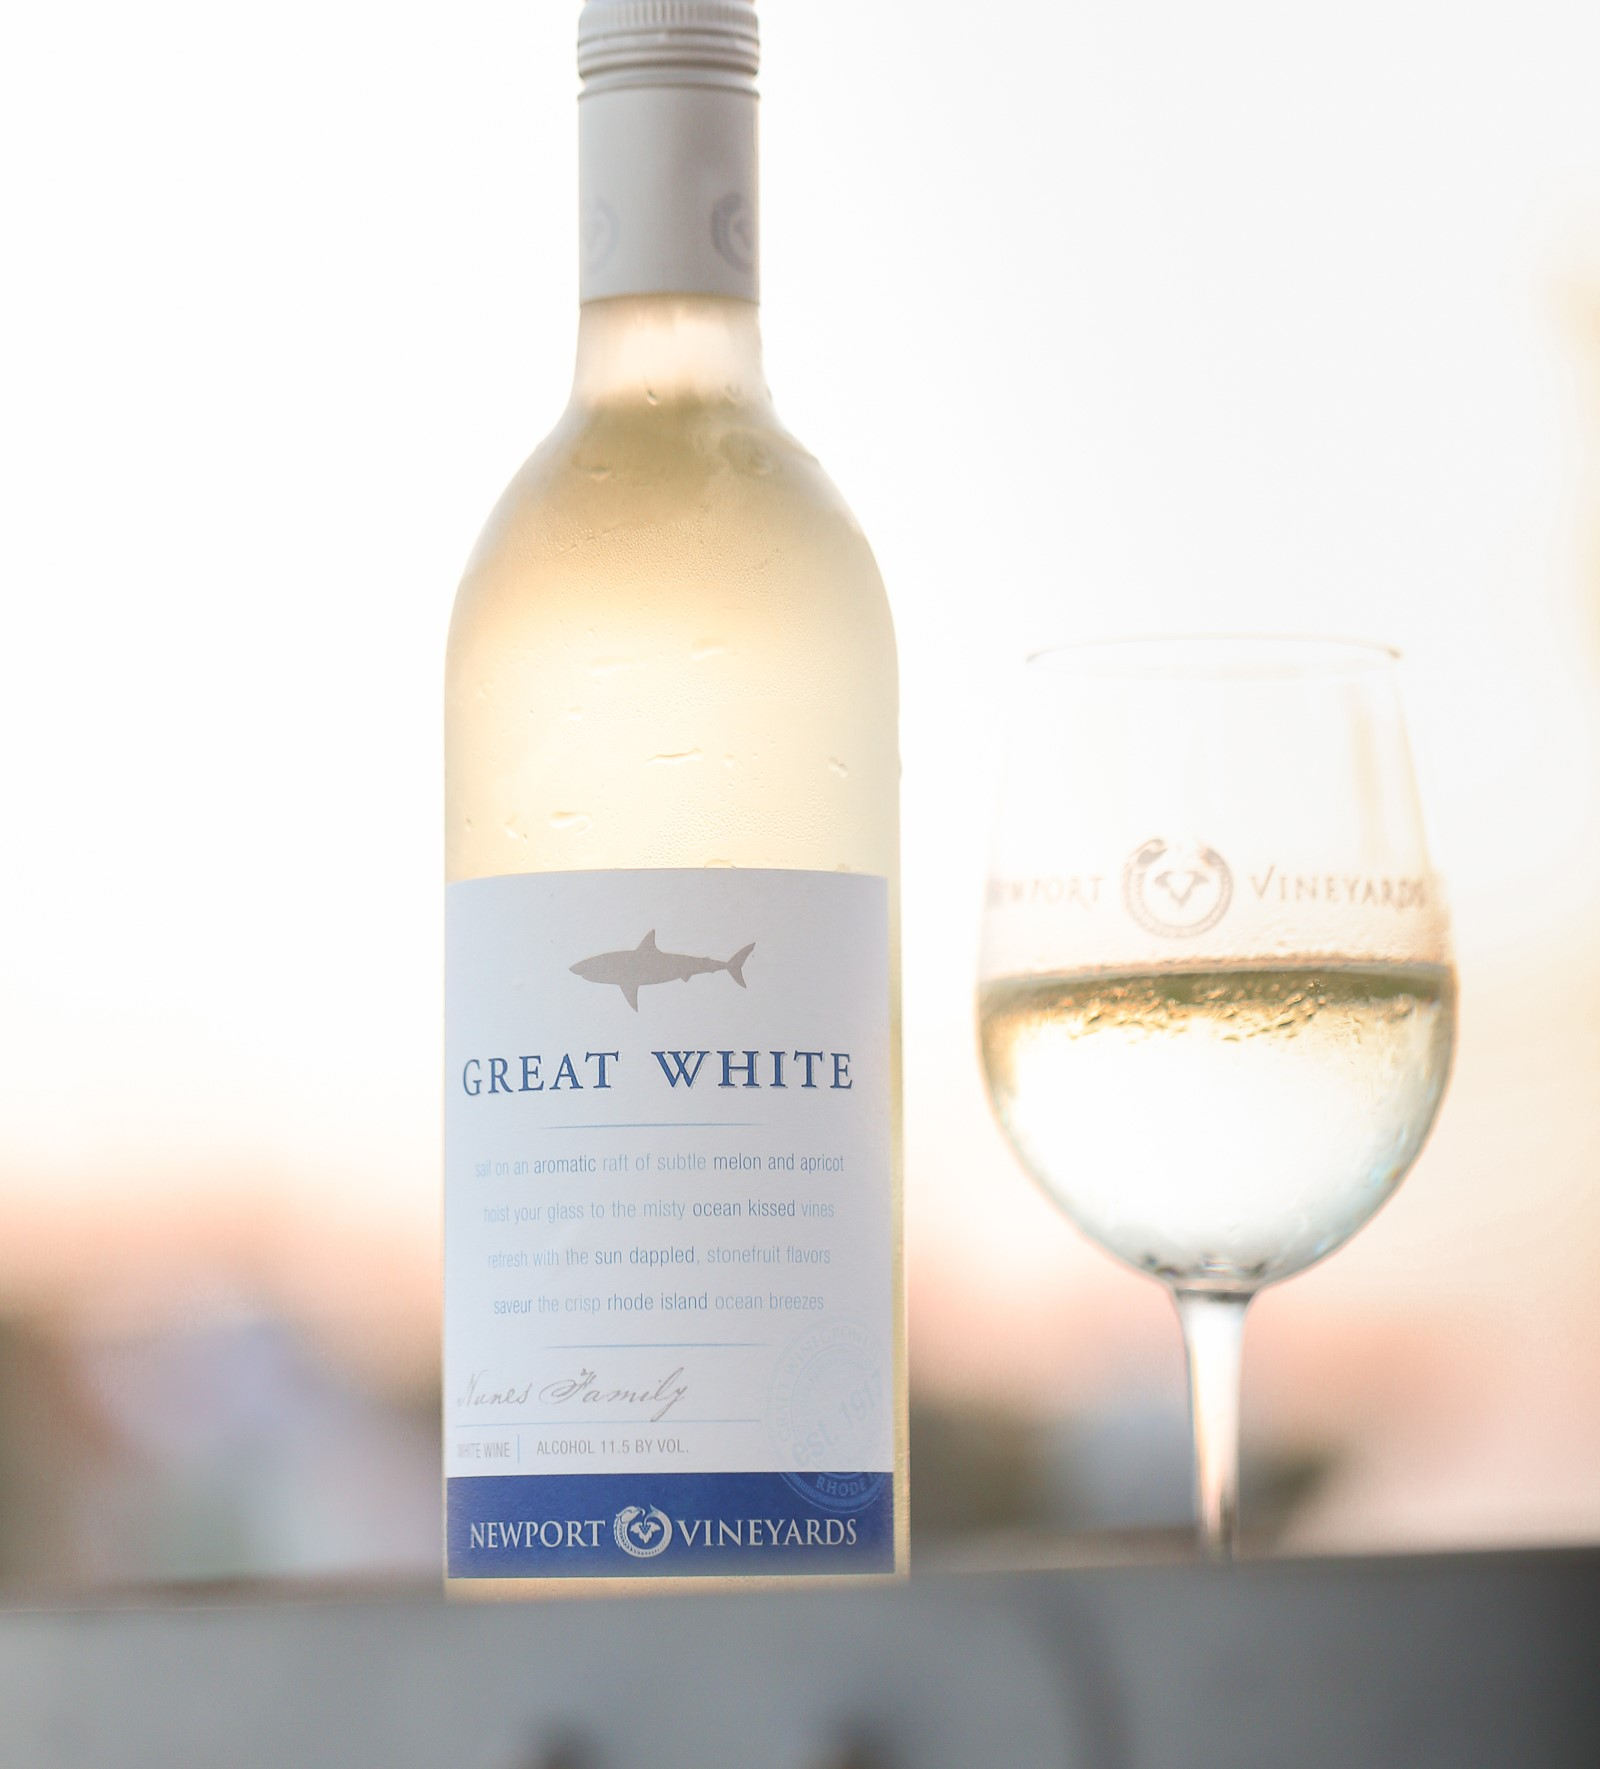 Newport Vineyards Great White Marks Twentieth Anniversary